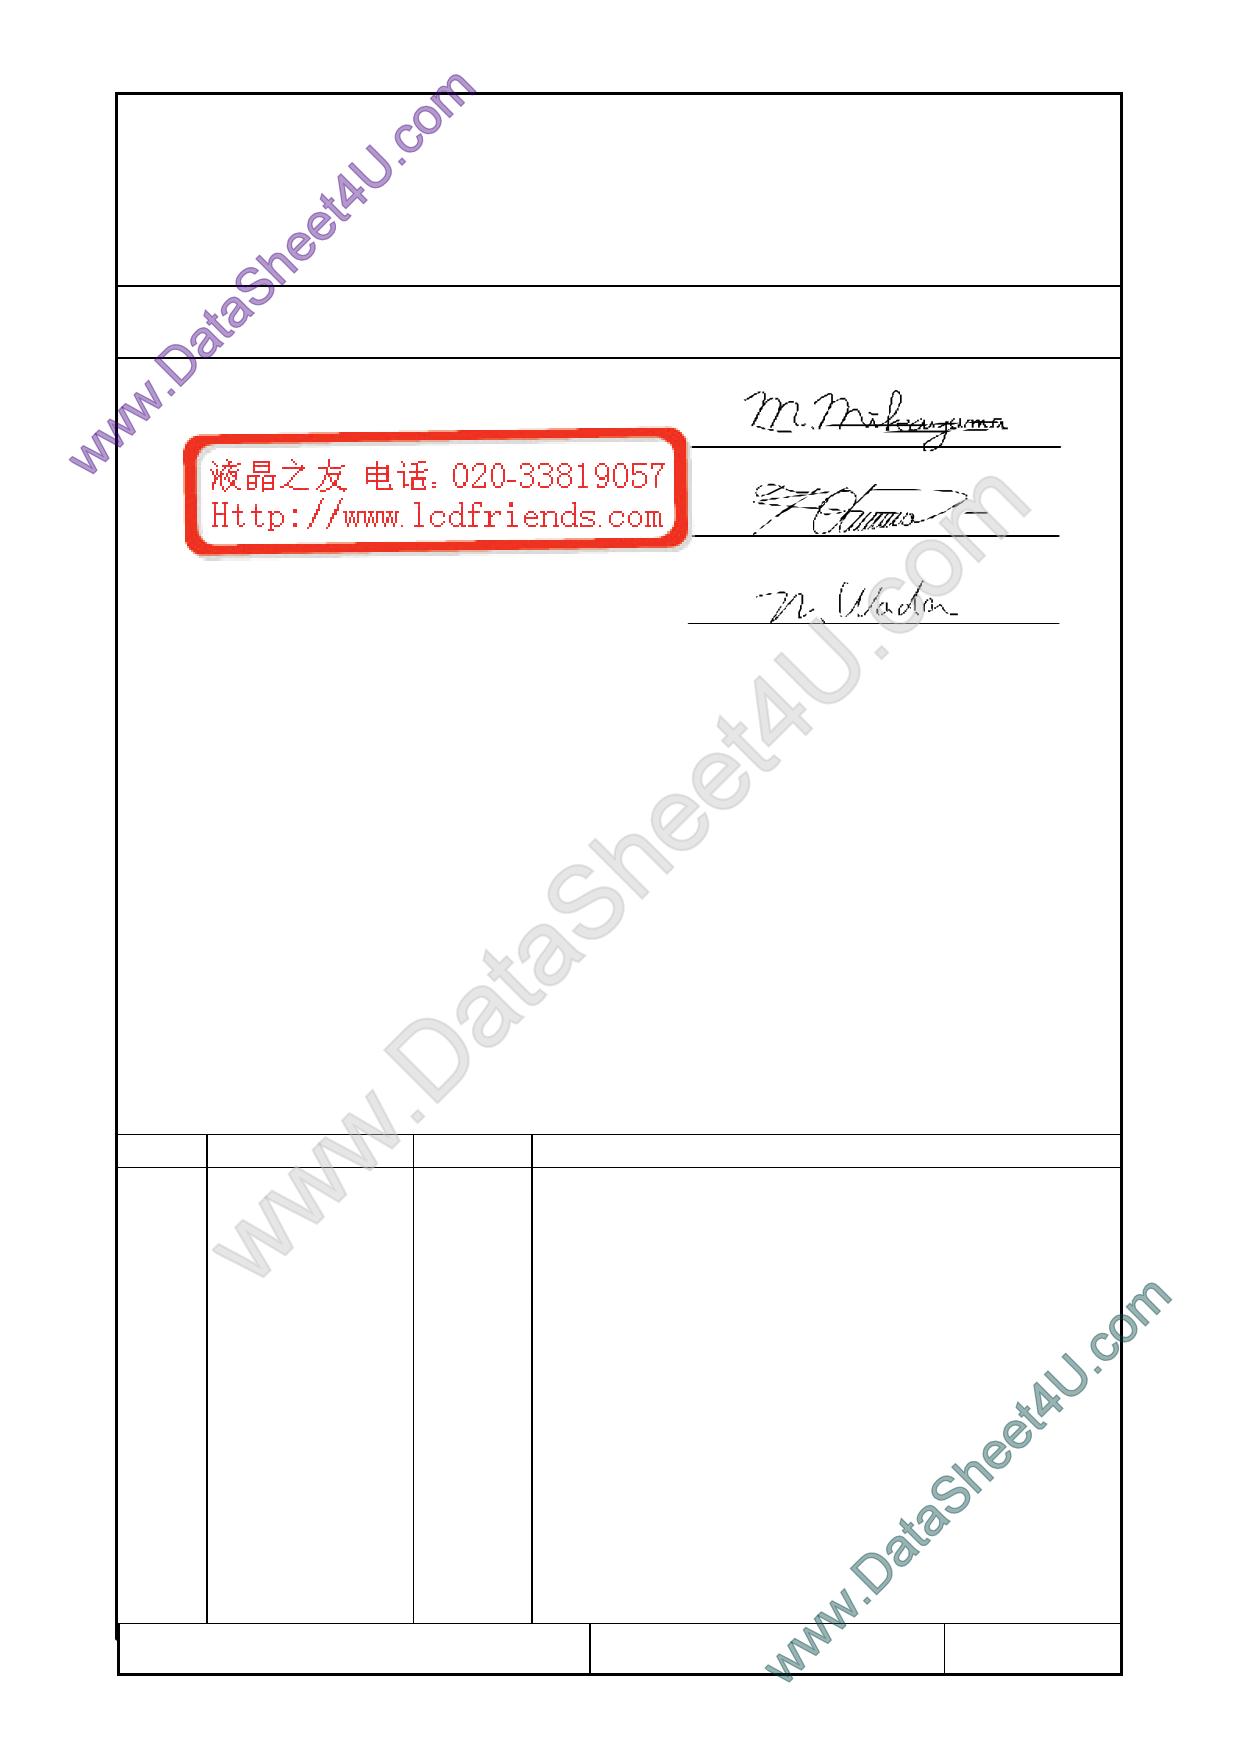 F-51477GNF-LW-AG Даташит, Описание, Даташиты